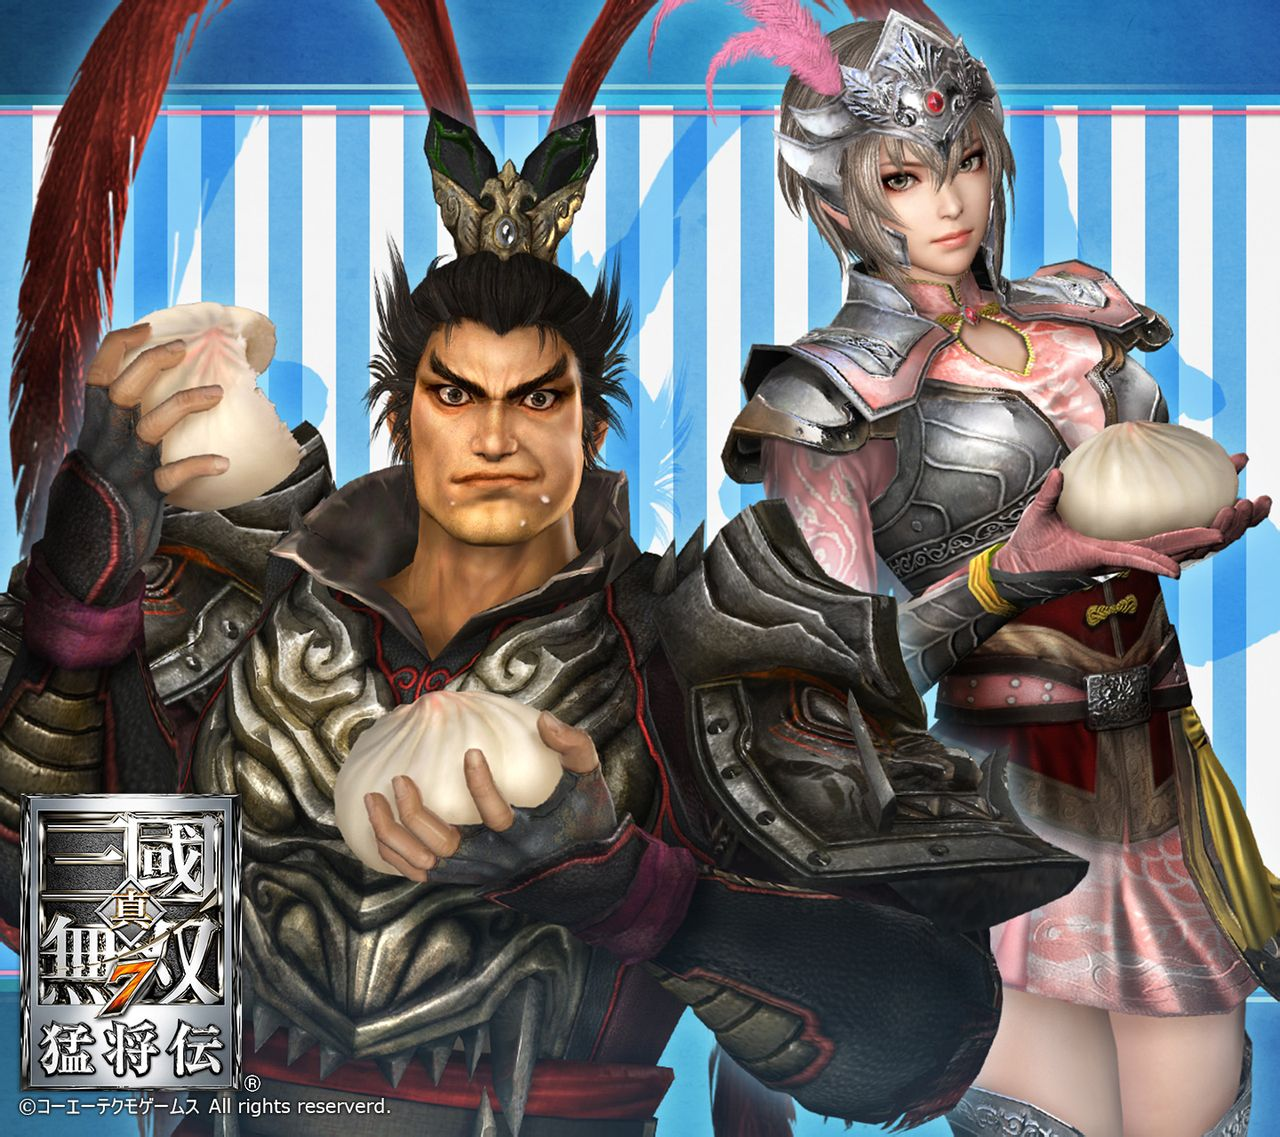 Warriors Orochi 3 Ultimate Vs Dynasty Warriors 8 Xtreme Legends: Meatbun Phone Wallpaper 02.jpg